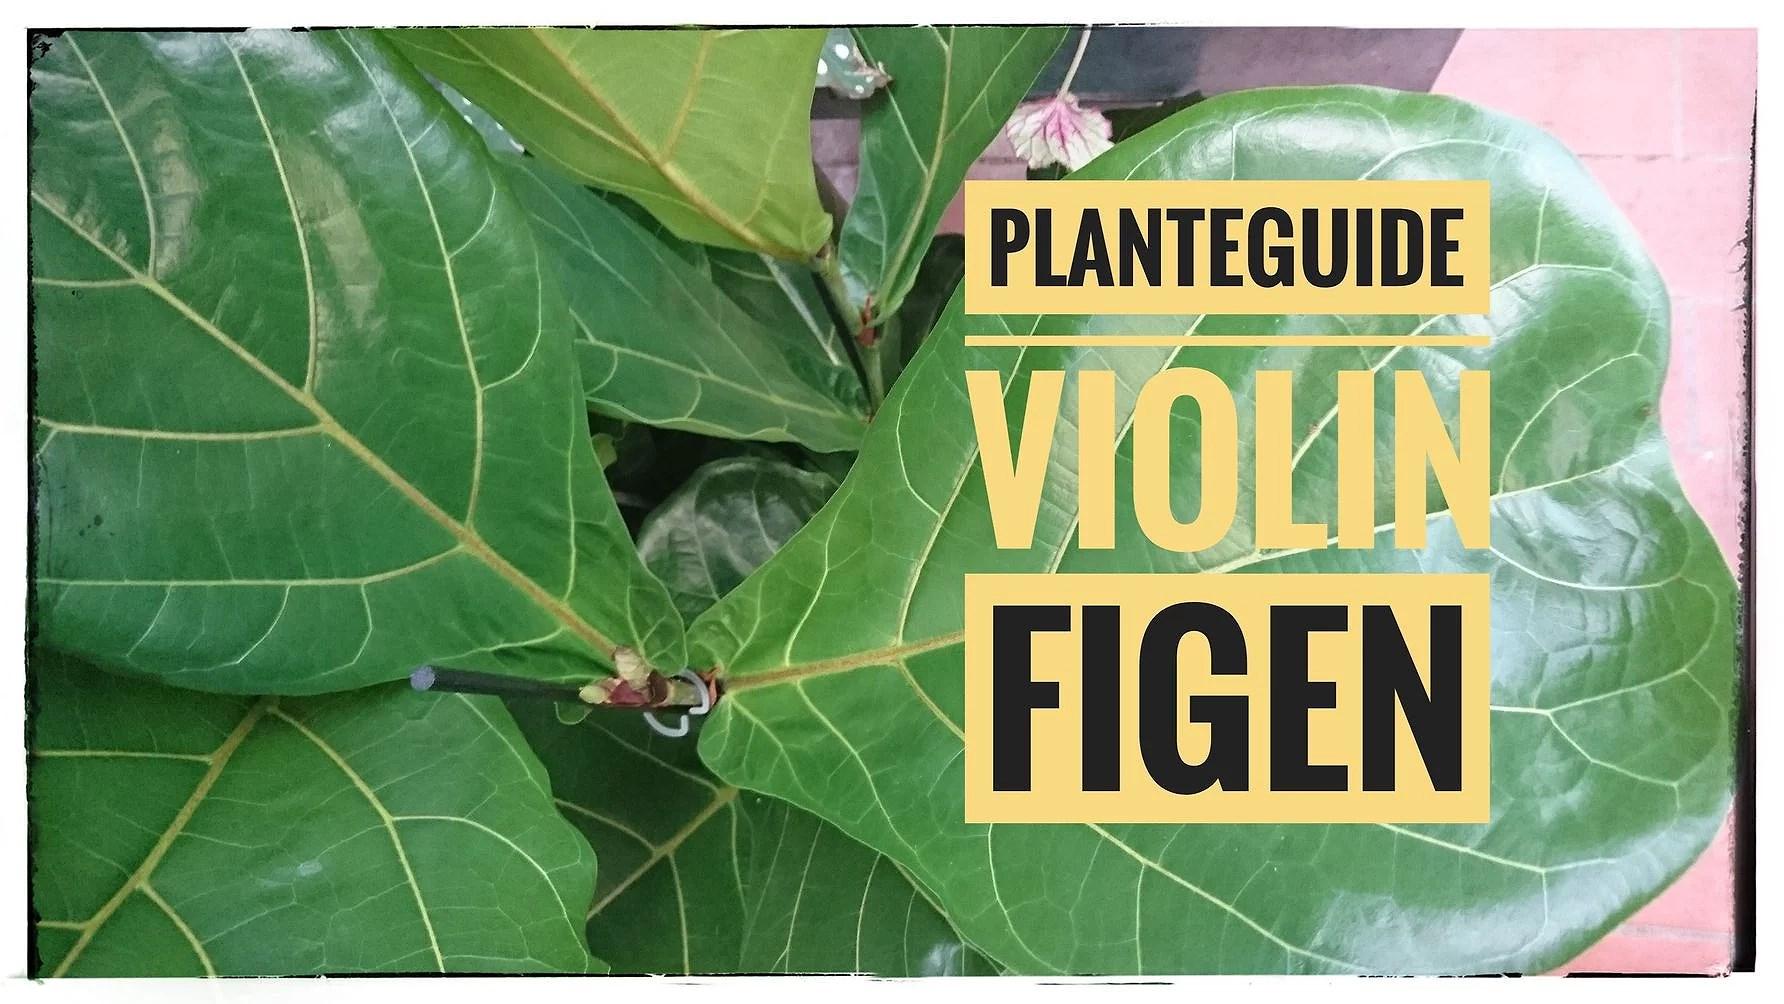 Planteguide Violinfigen